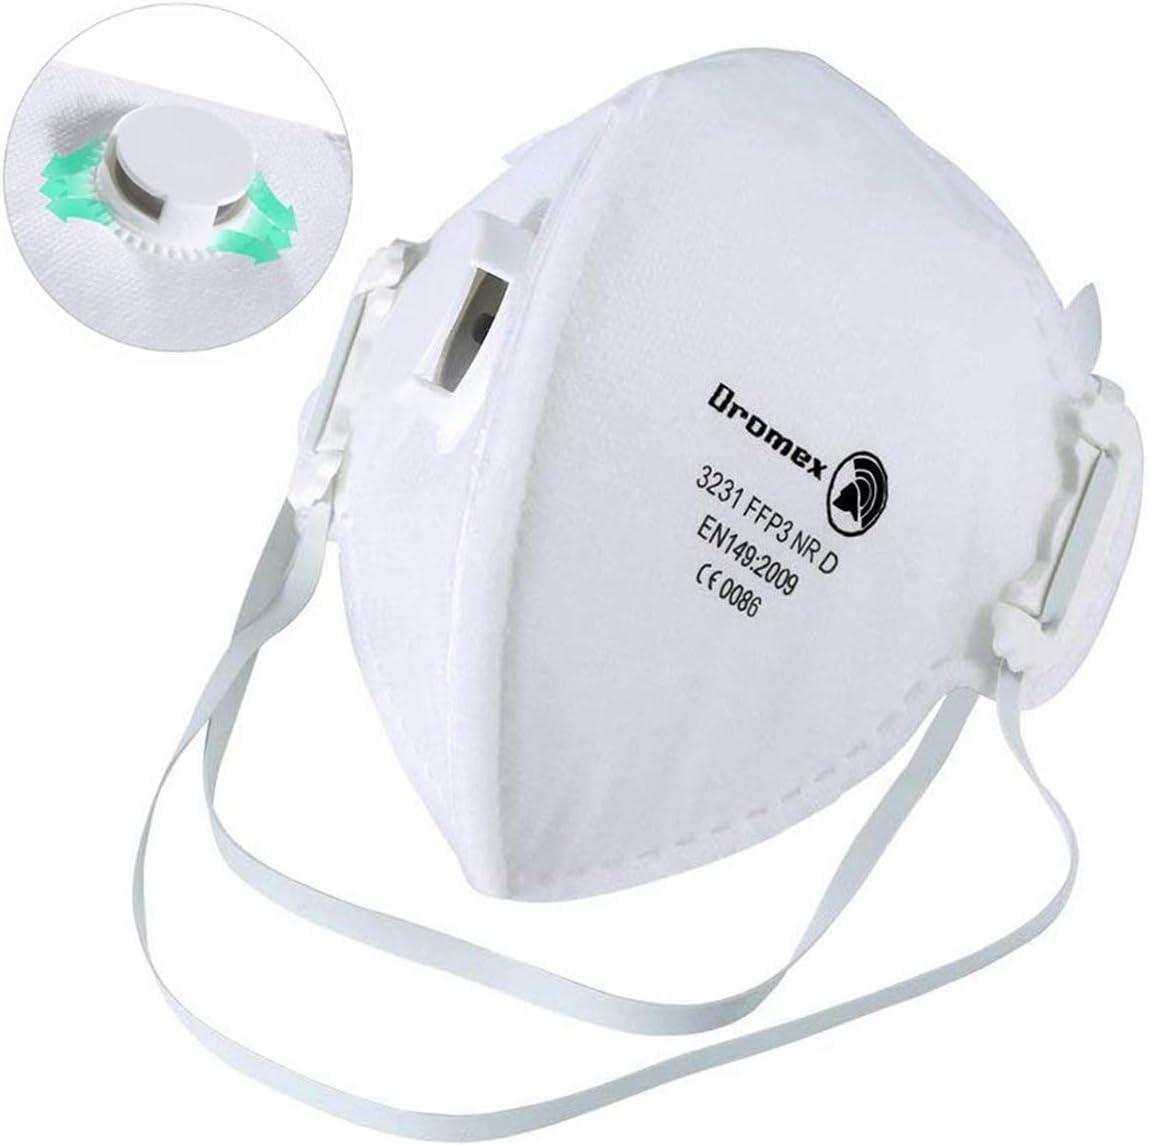 Mascarilla Anti Polución FFP3, Mascarilla de Protección 99% Bacterias Anti PM2.5 Neumonía Protección contra la Influenza Unisex Exterior Anti Polvo de Humo (12pcs)